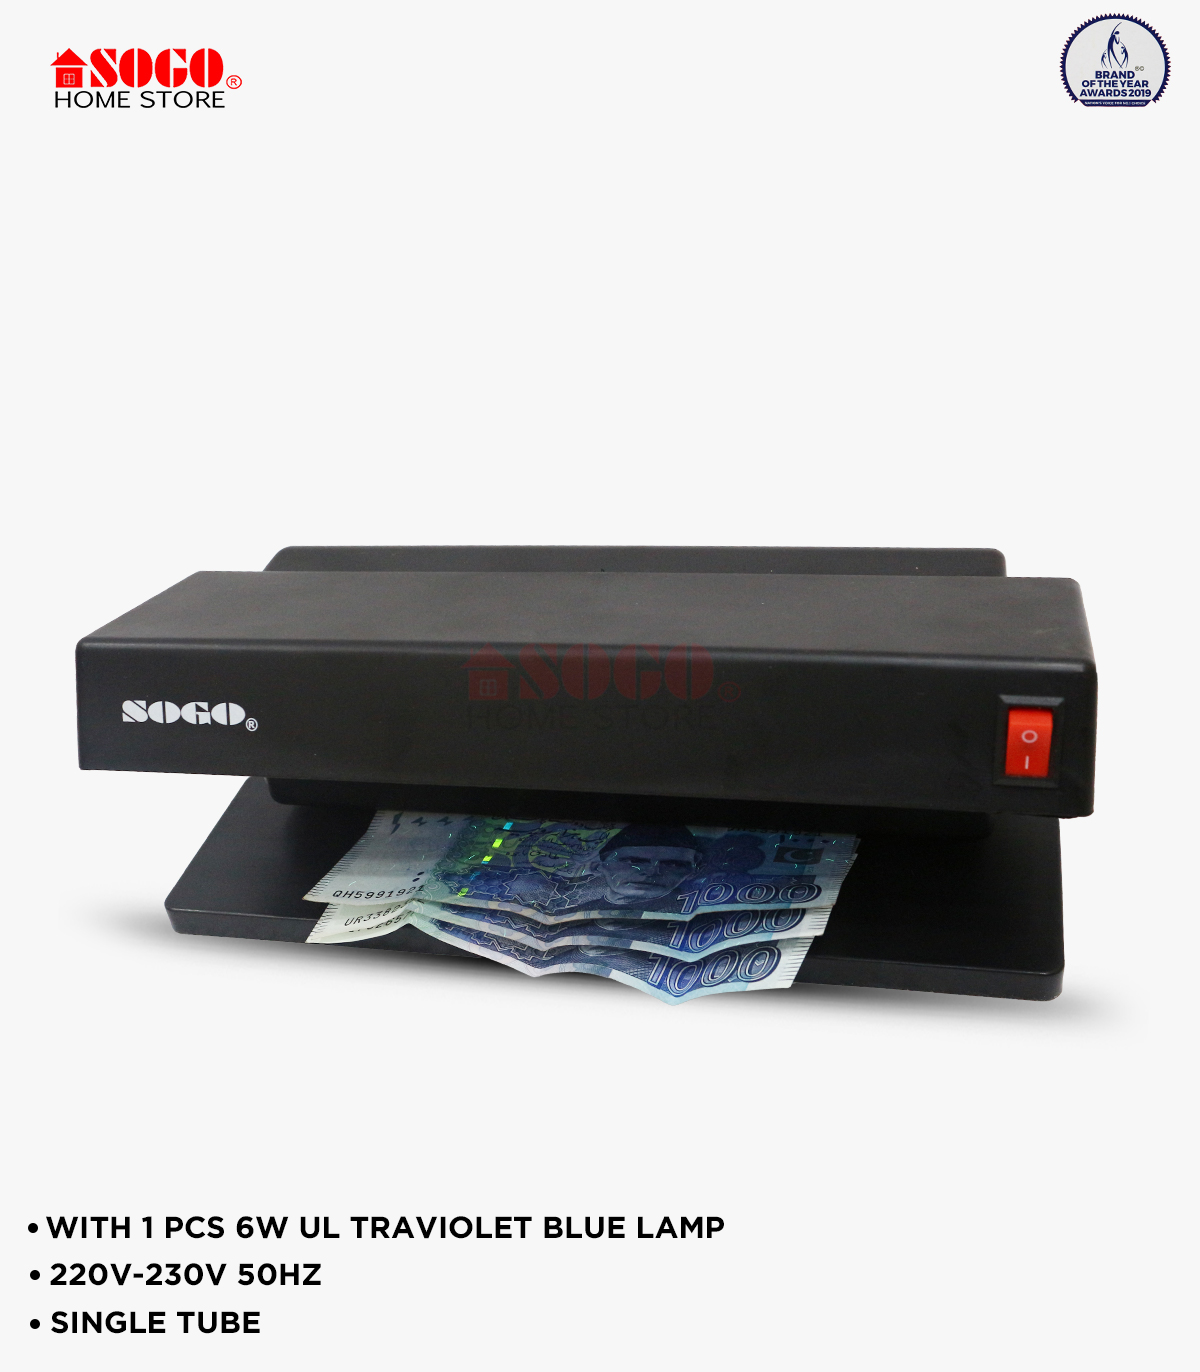 Sogo Currency Checker (jpn-007)